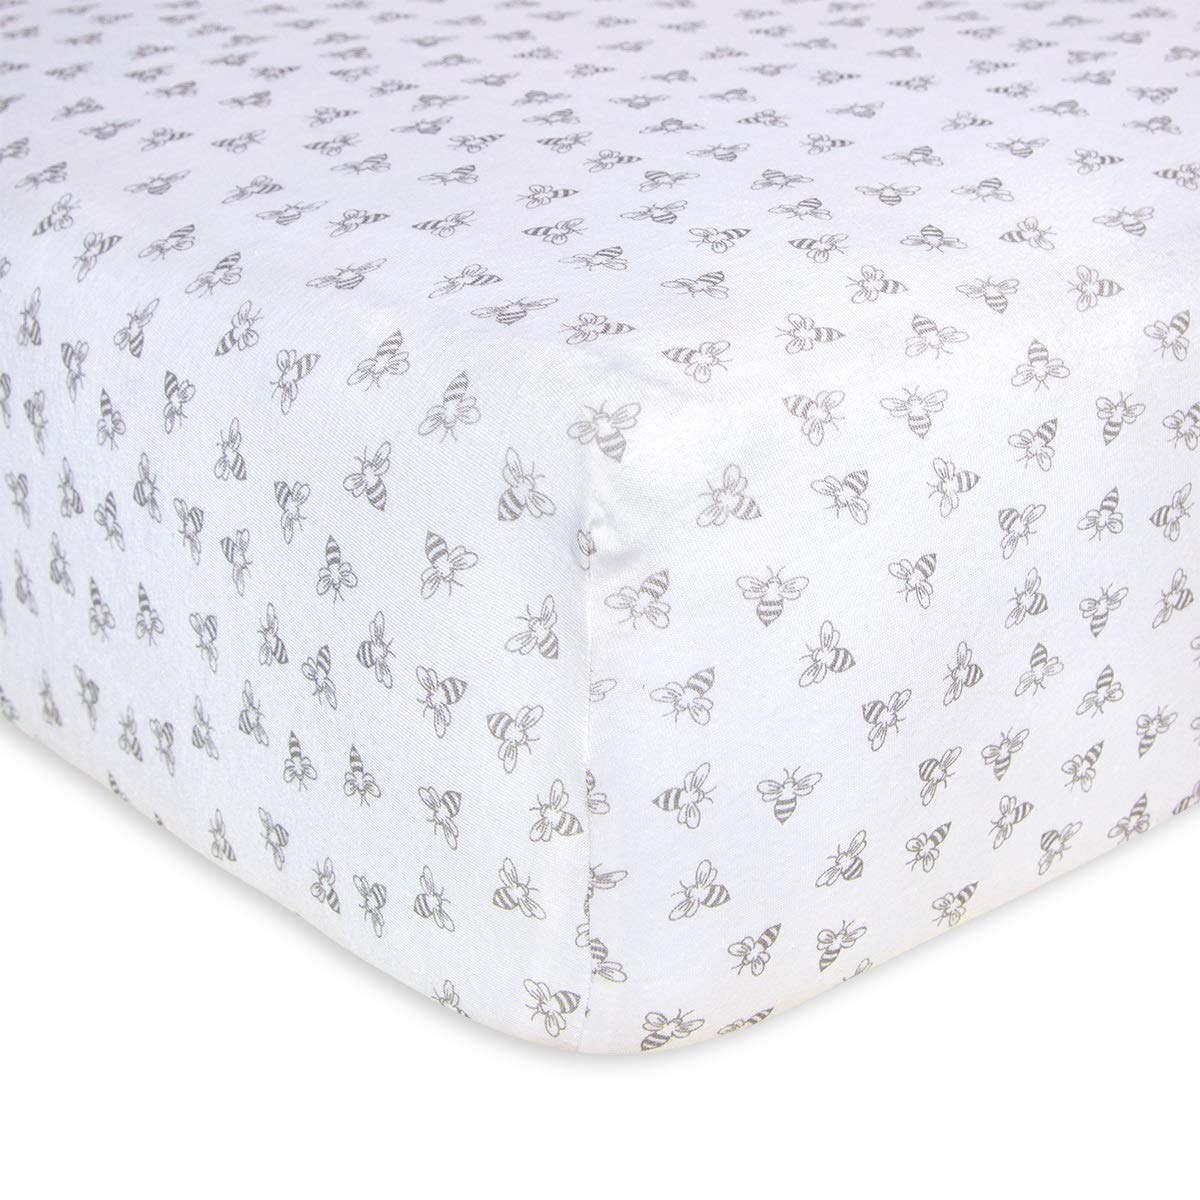 Burt's Bees Baby - Fitted Crib Sheet, Girls & Unisex 100% Organic Cotton Crib Sheet for Standard Crib and Toddler Mattresses (Heather Grey Honeybee Print) by Burt's Bees Baby